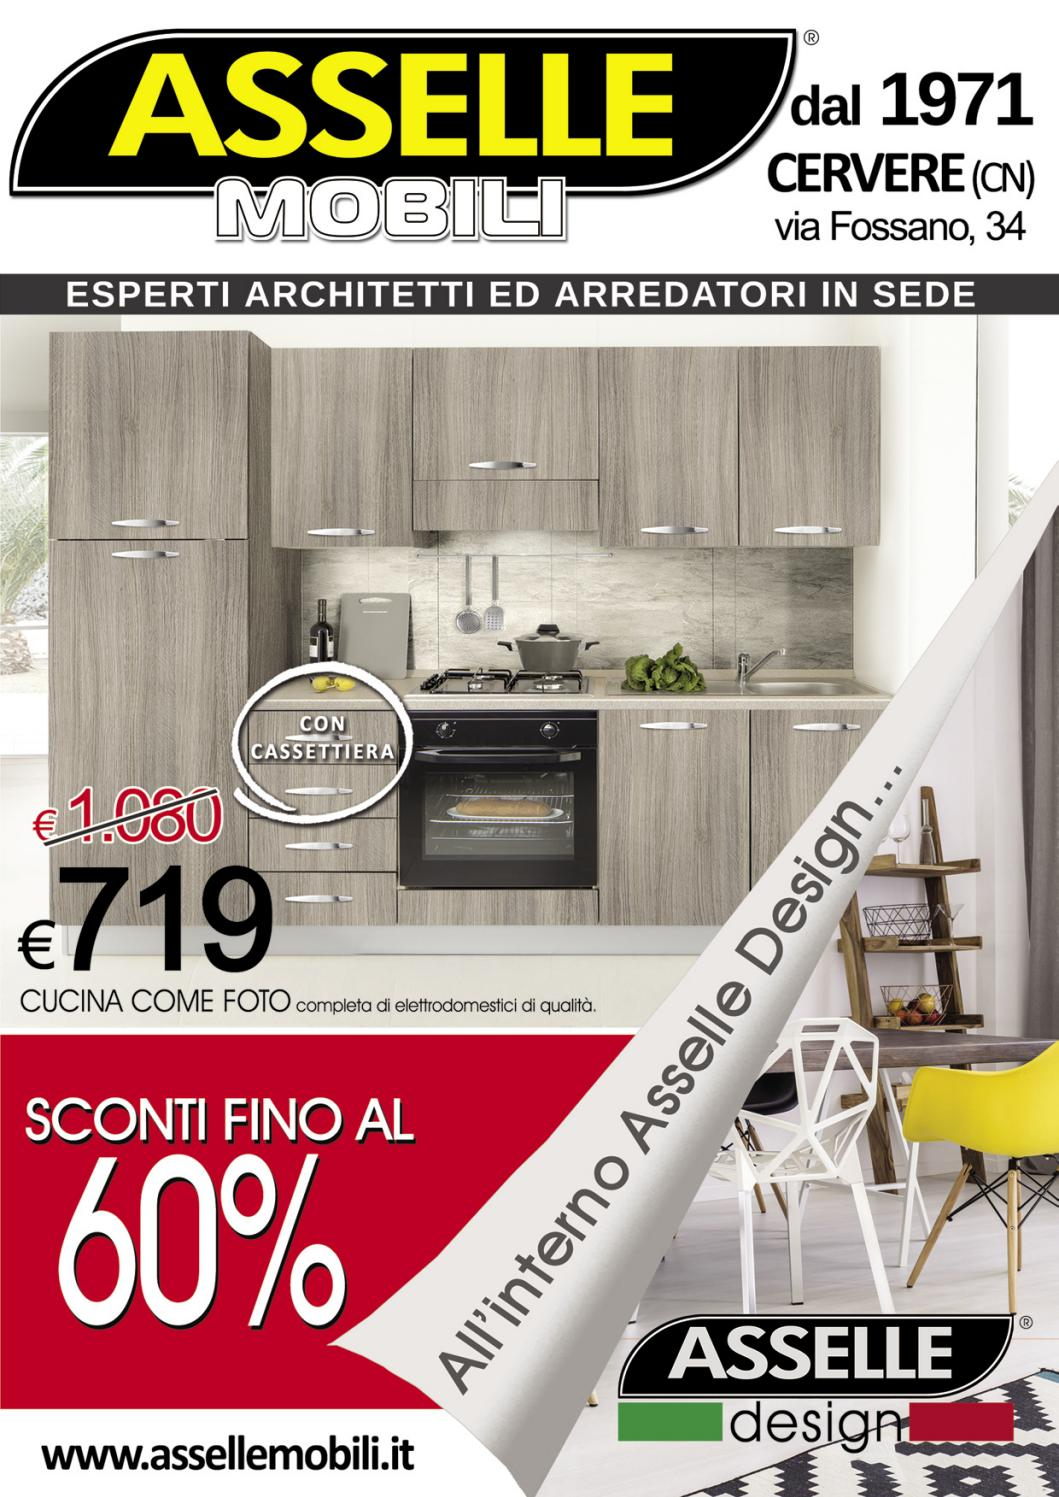 asselle mobili catalogo offerte 2017 by asselle mobili issuu